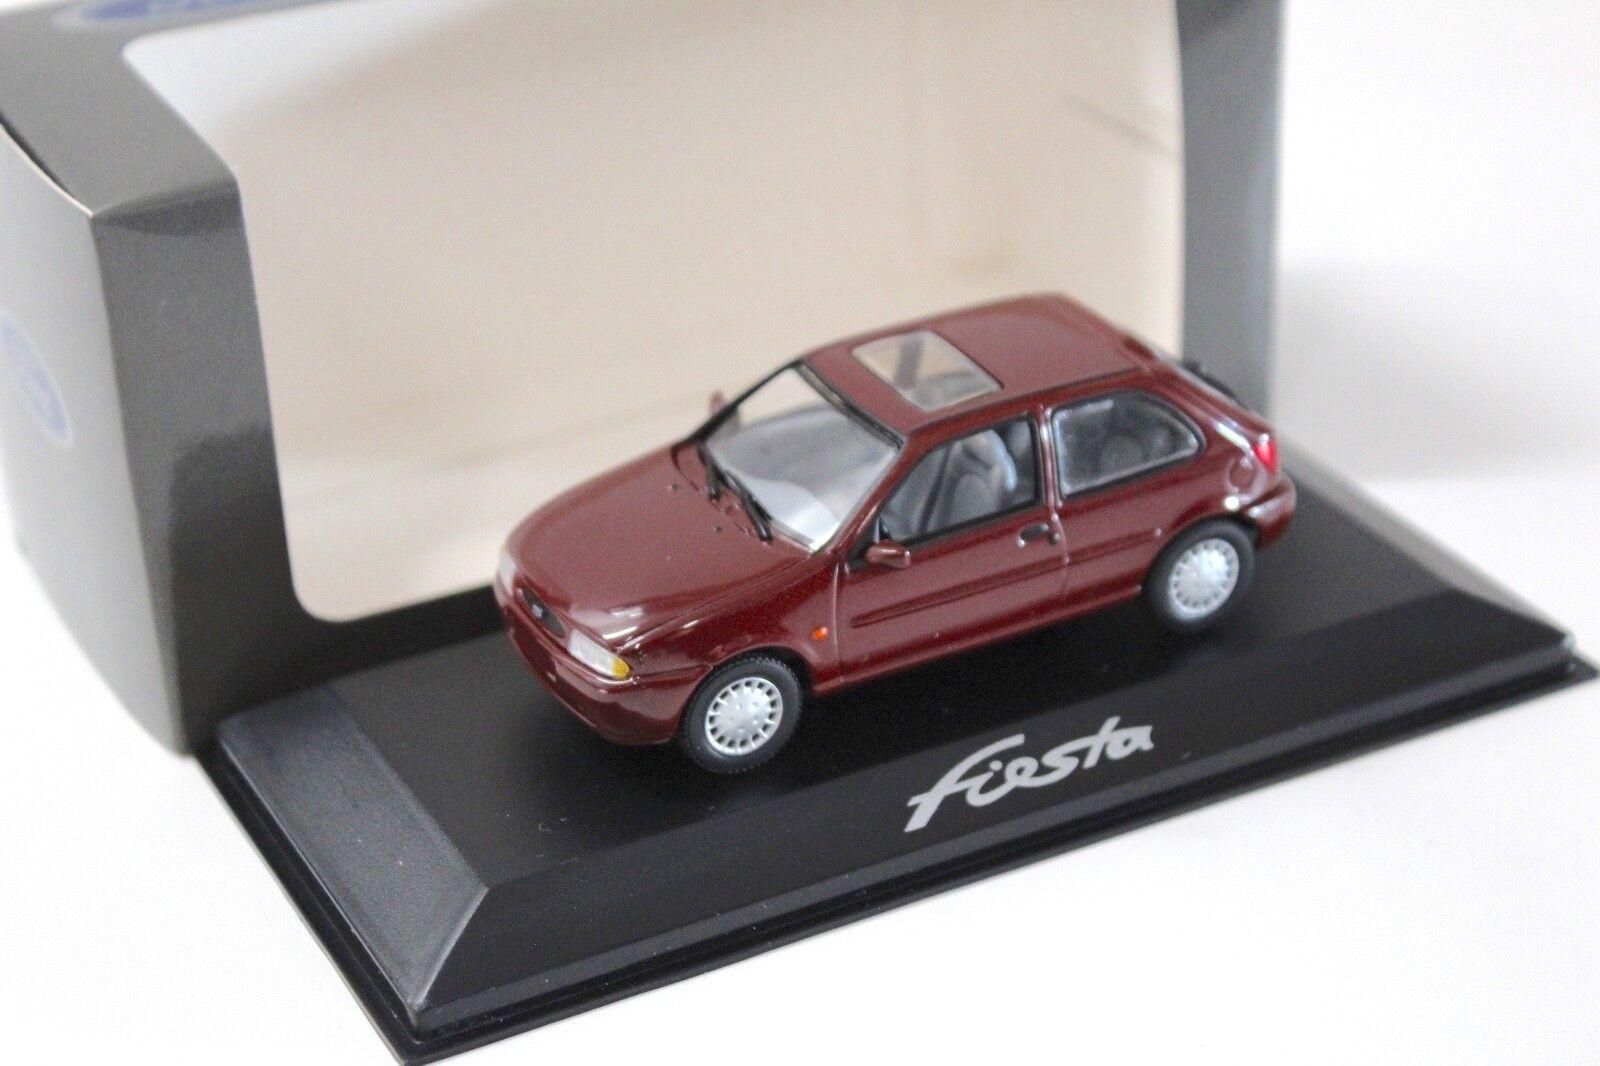 1 43 Minichamps Ford Fiesta Ghia 1996 Dark rouge Dealer New chez Premium-modelcars